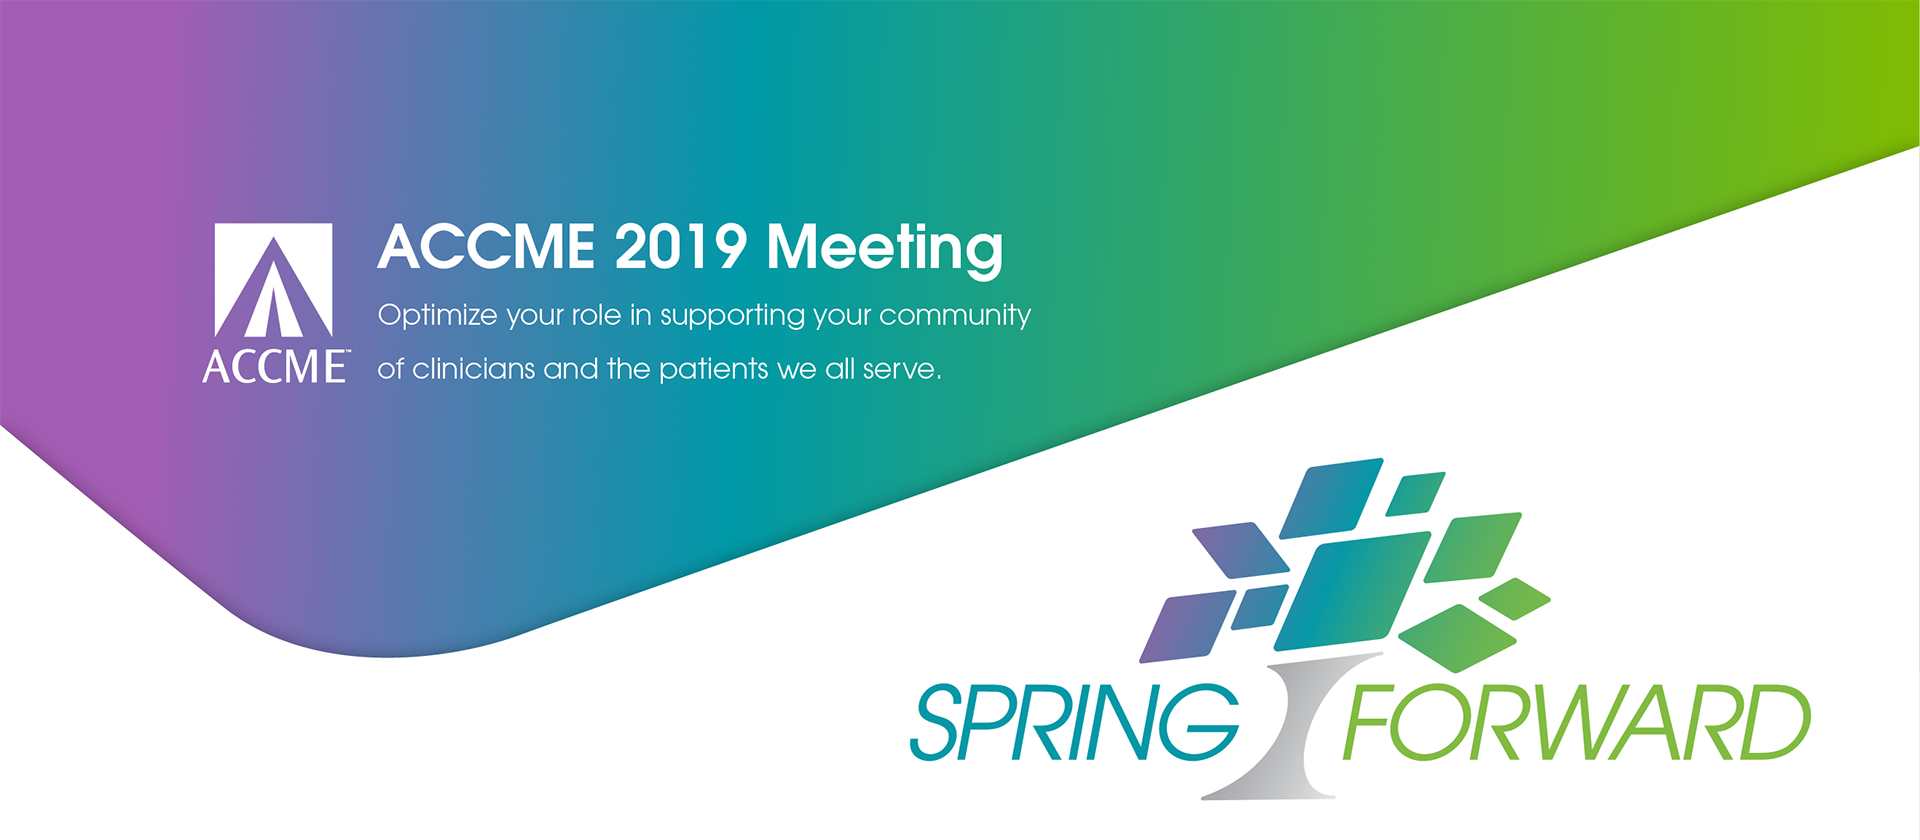 ACCME 2019 Meeting: Spring Forward